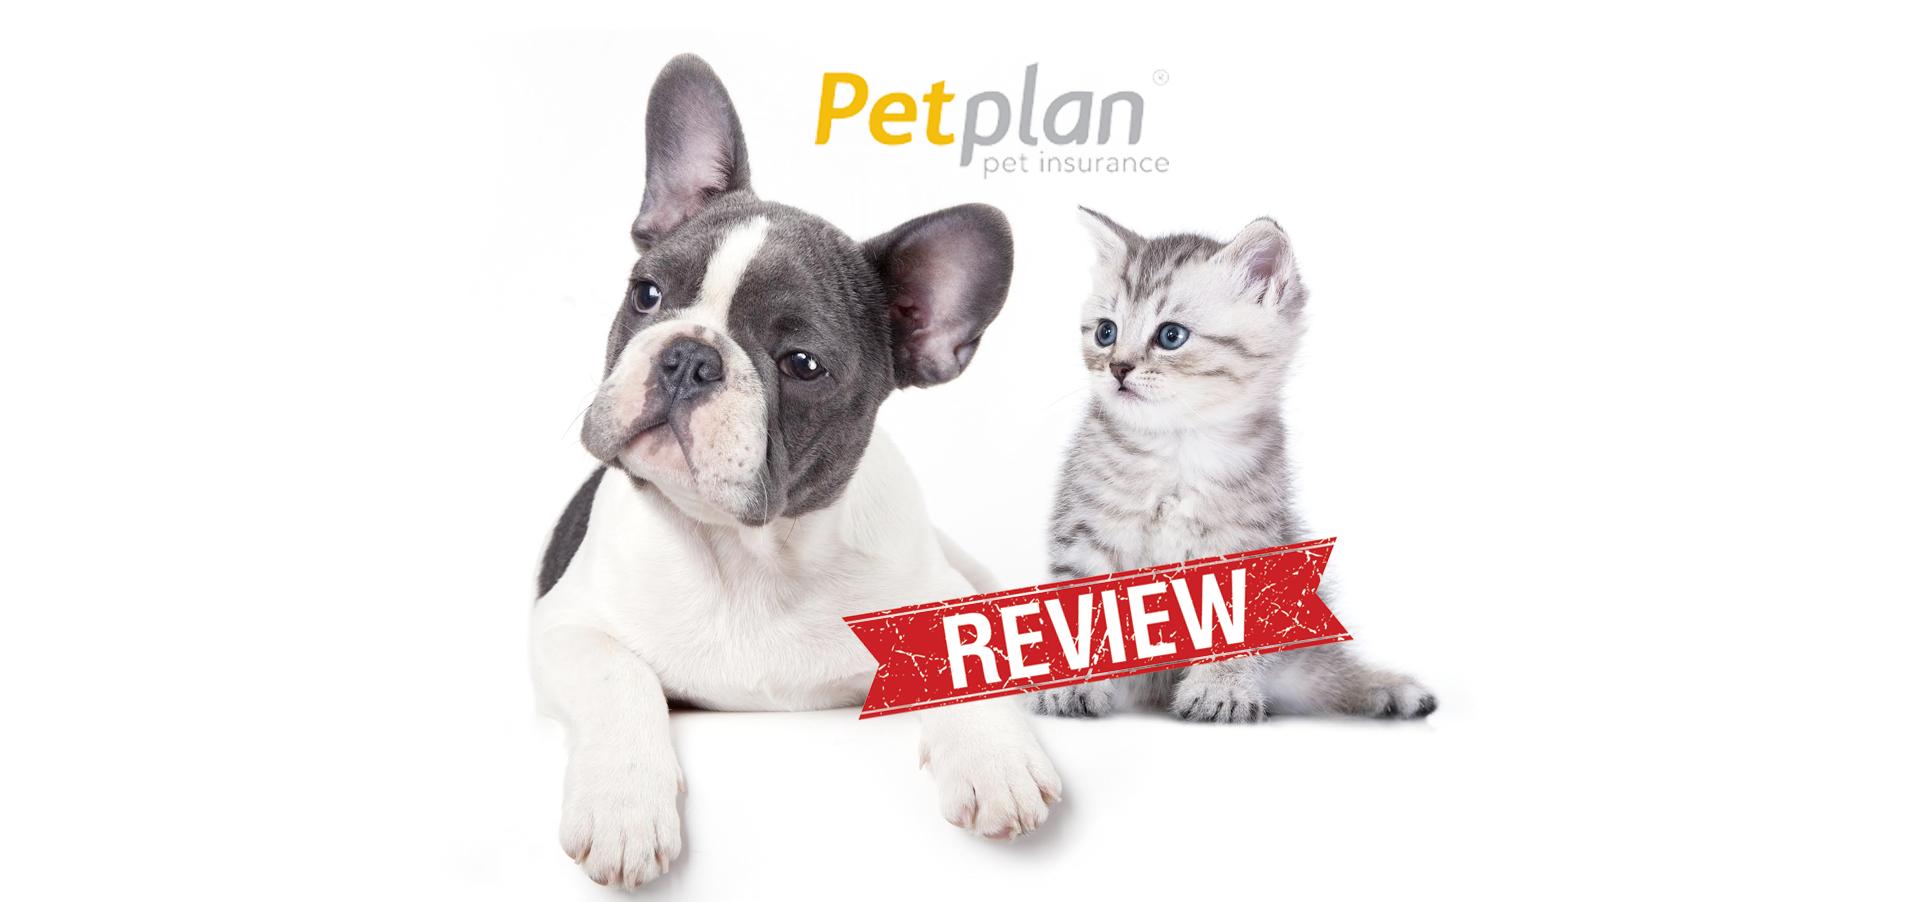 Petplan Pet Insurance Reviews Pet insurance reviews